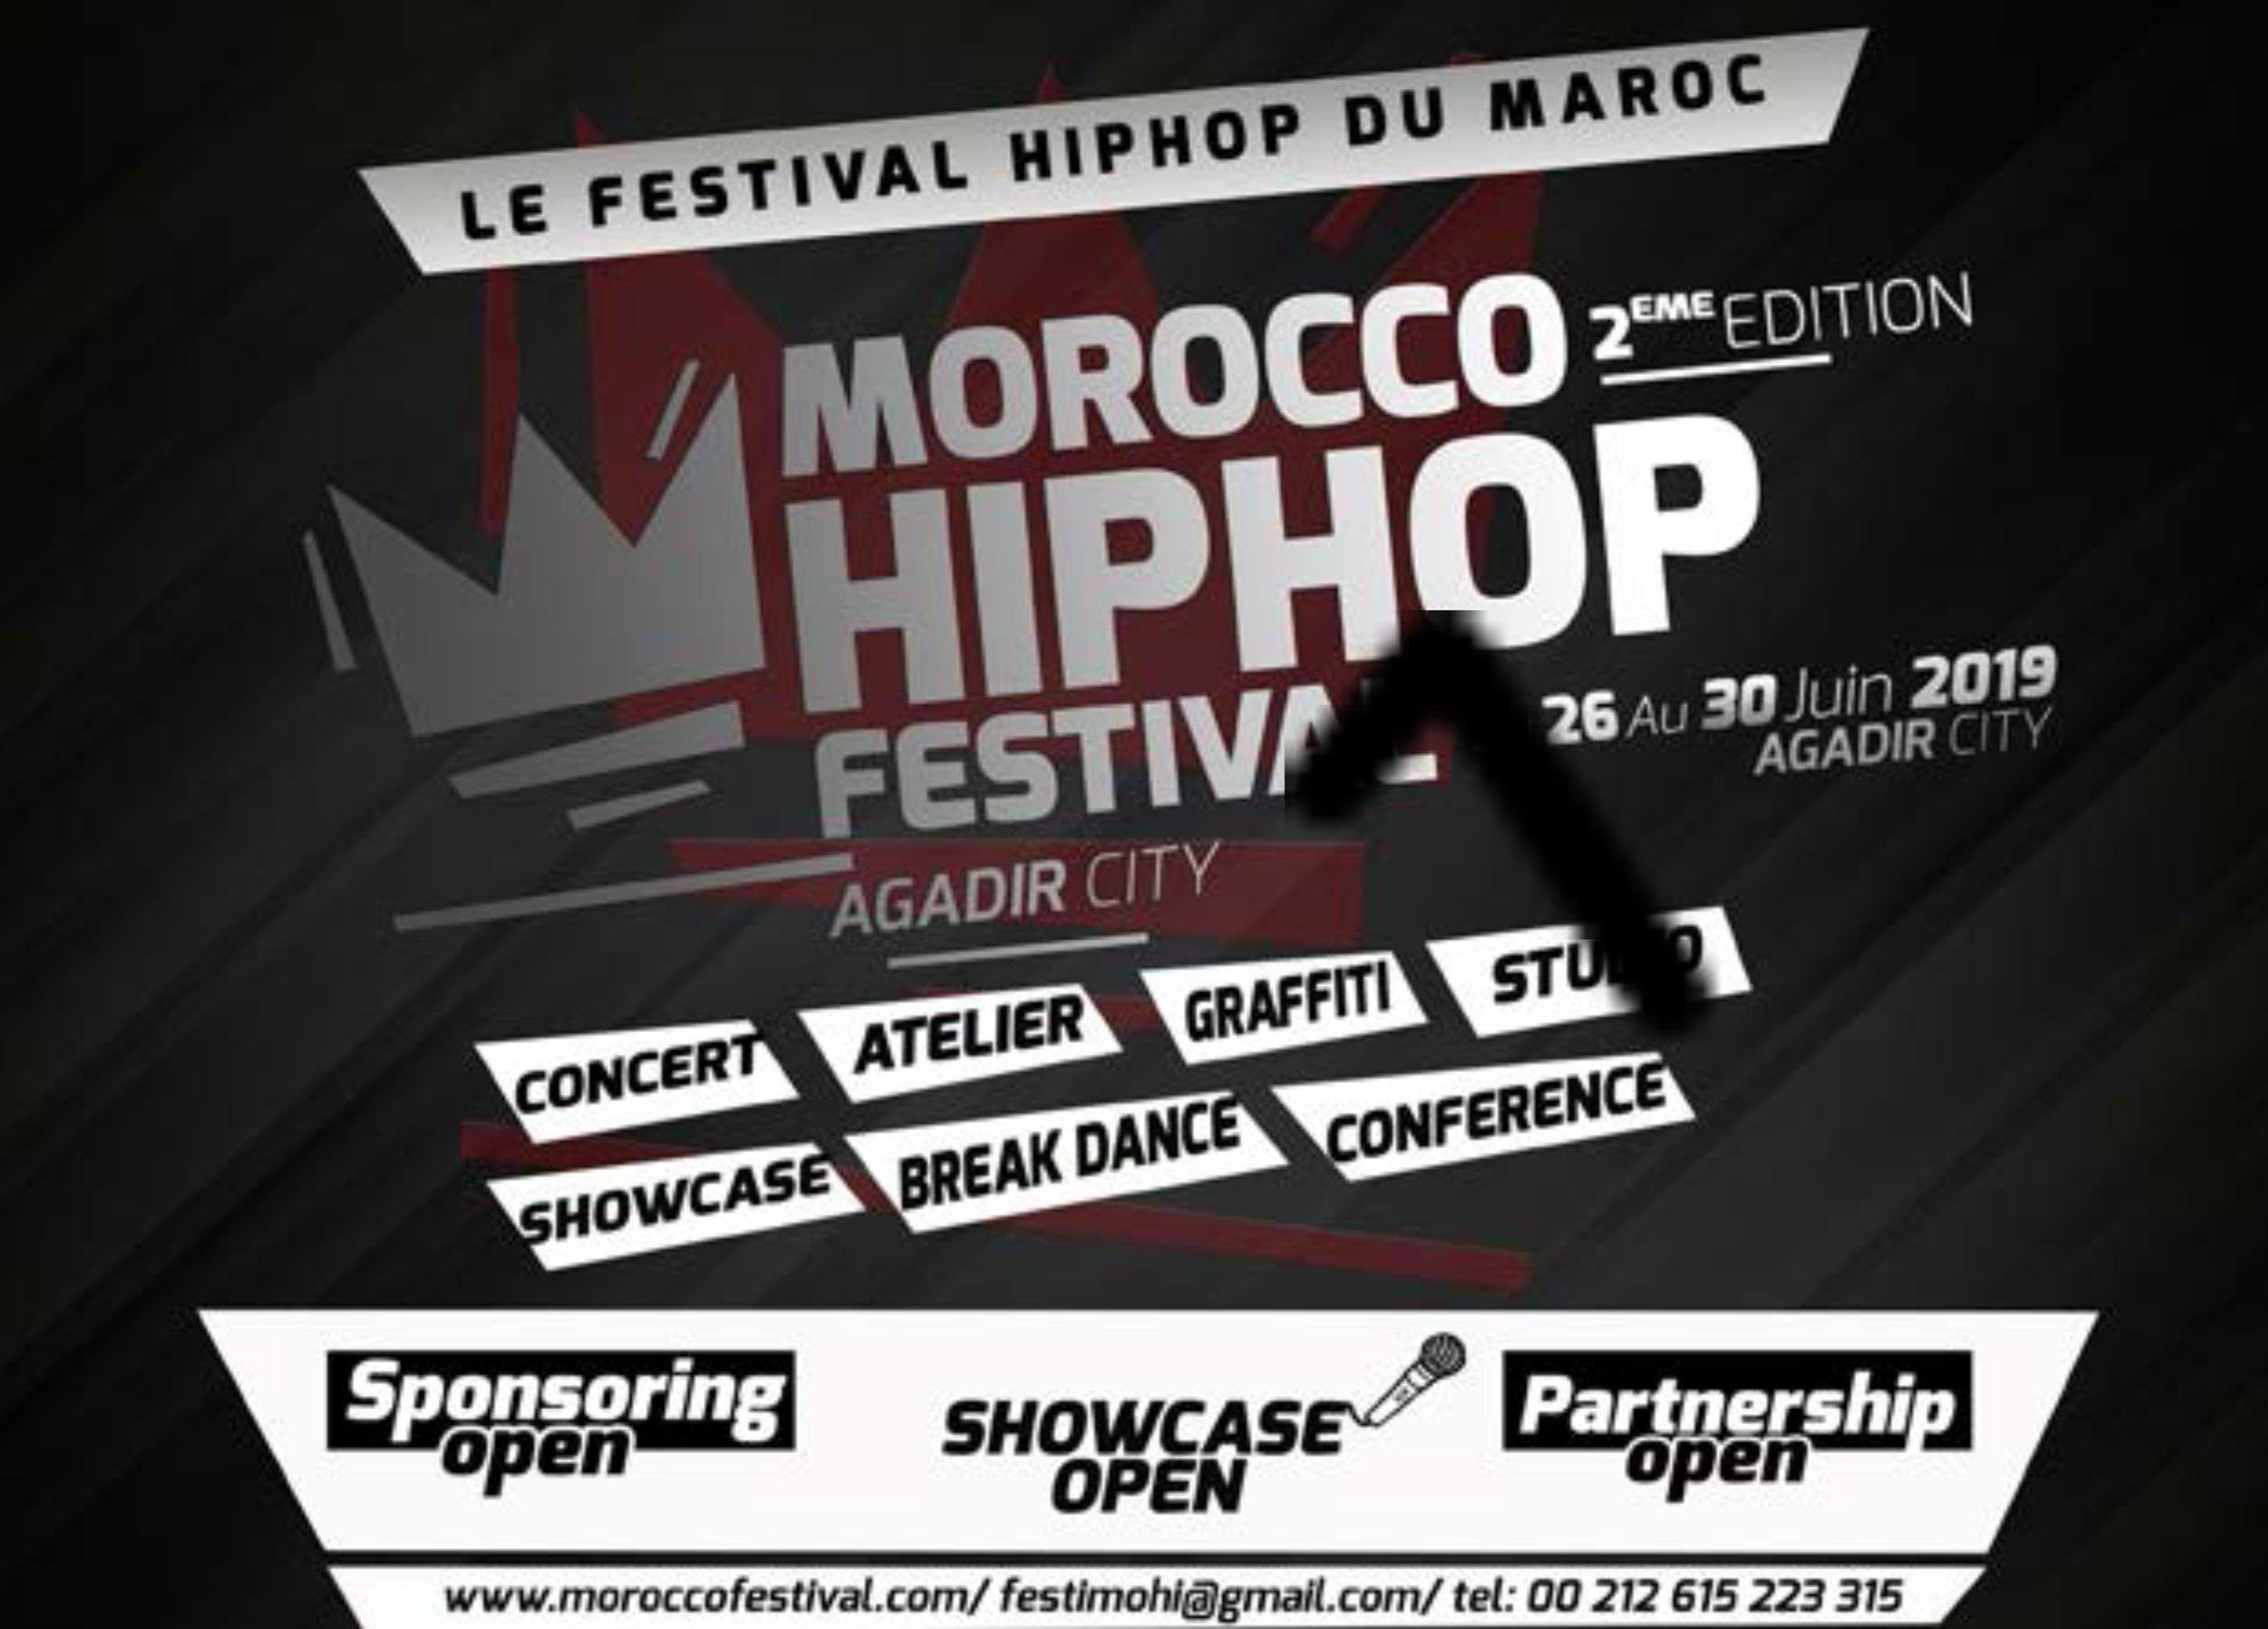 Agadir City Hip Hop Festival, South coast of Morocco June 26th-30th